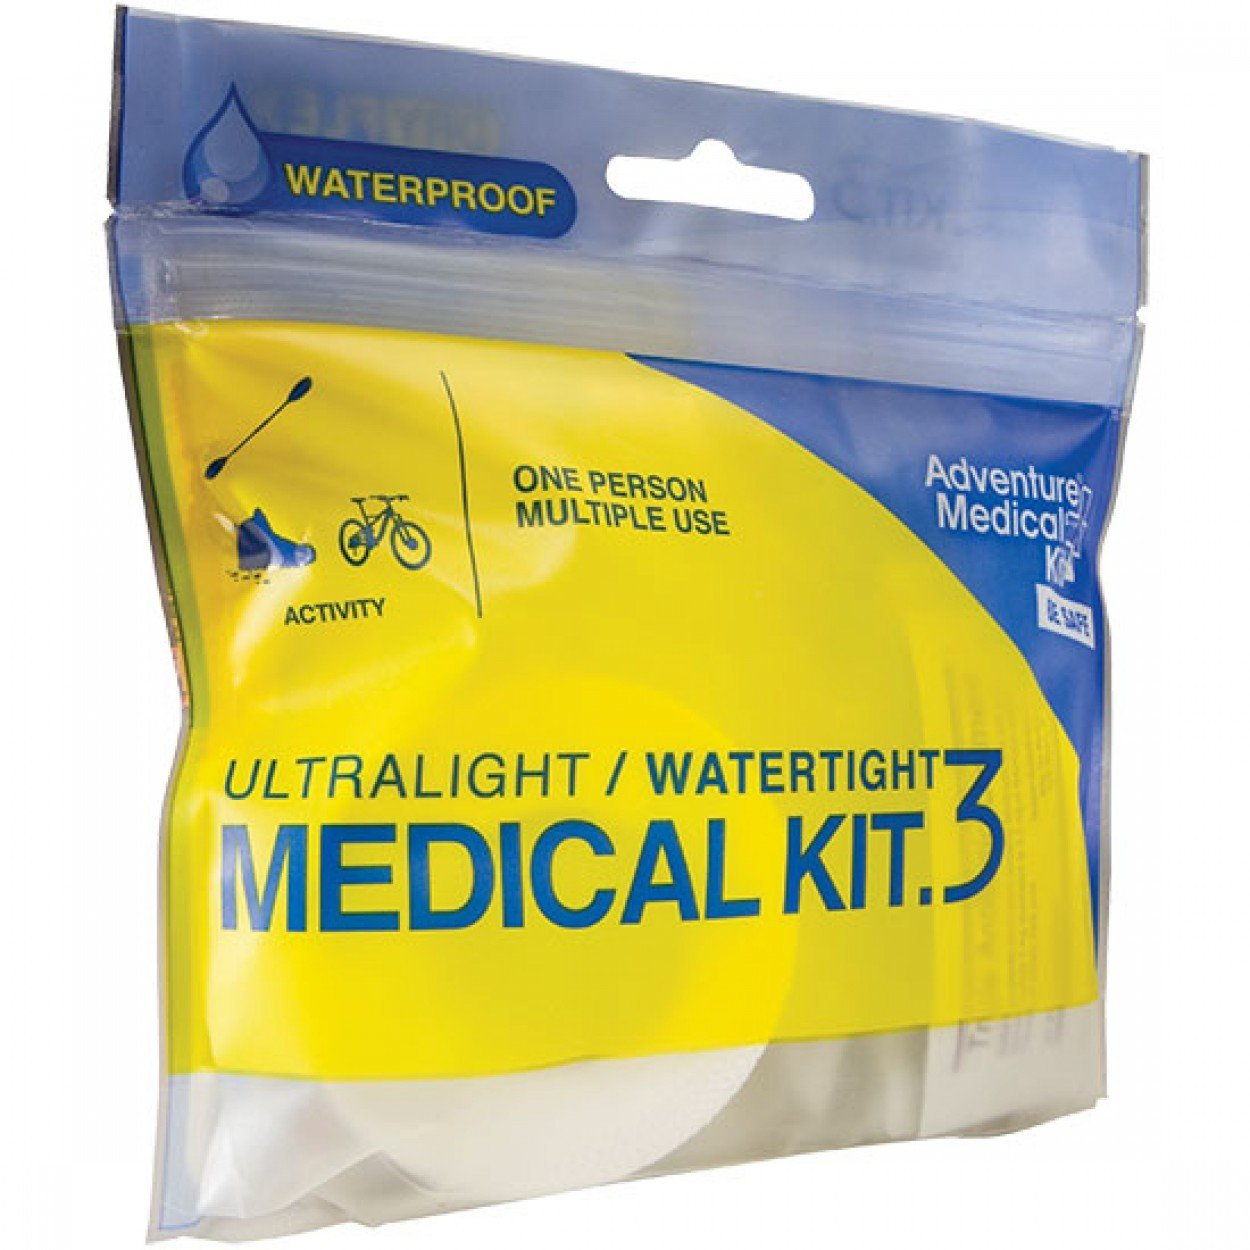 Adventure Medical Kit Ultralight & Watertight .3